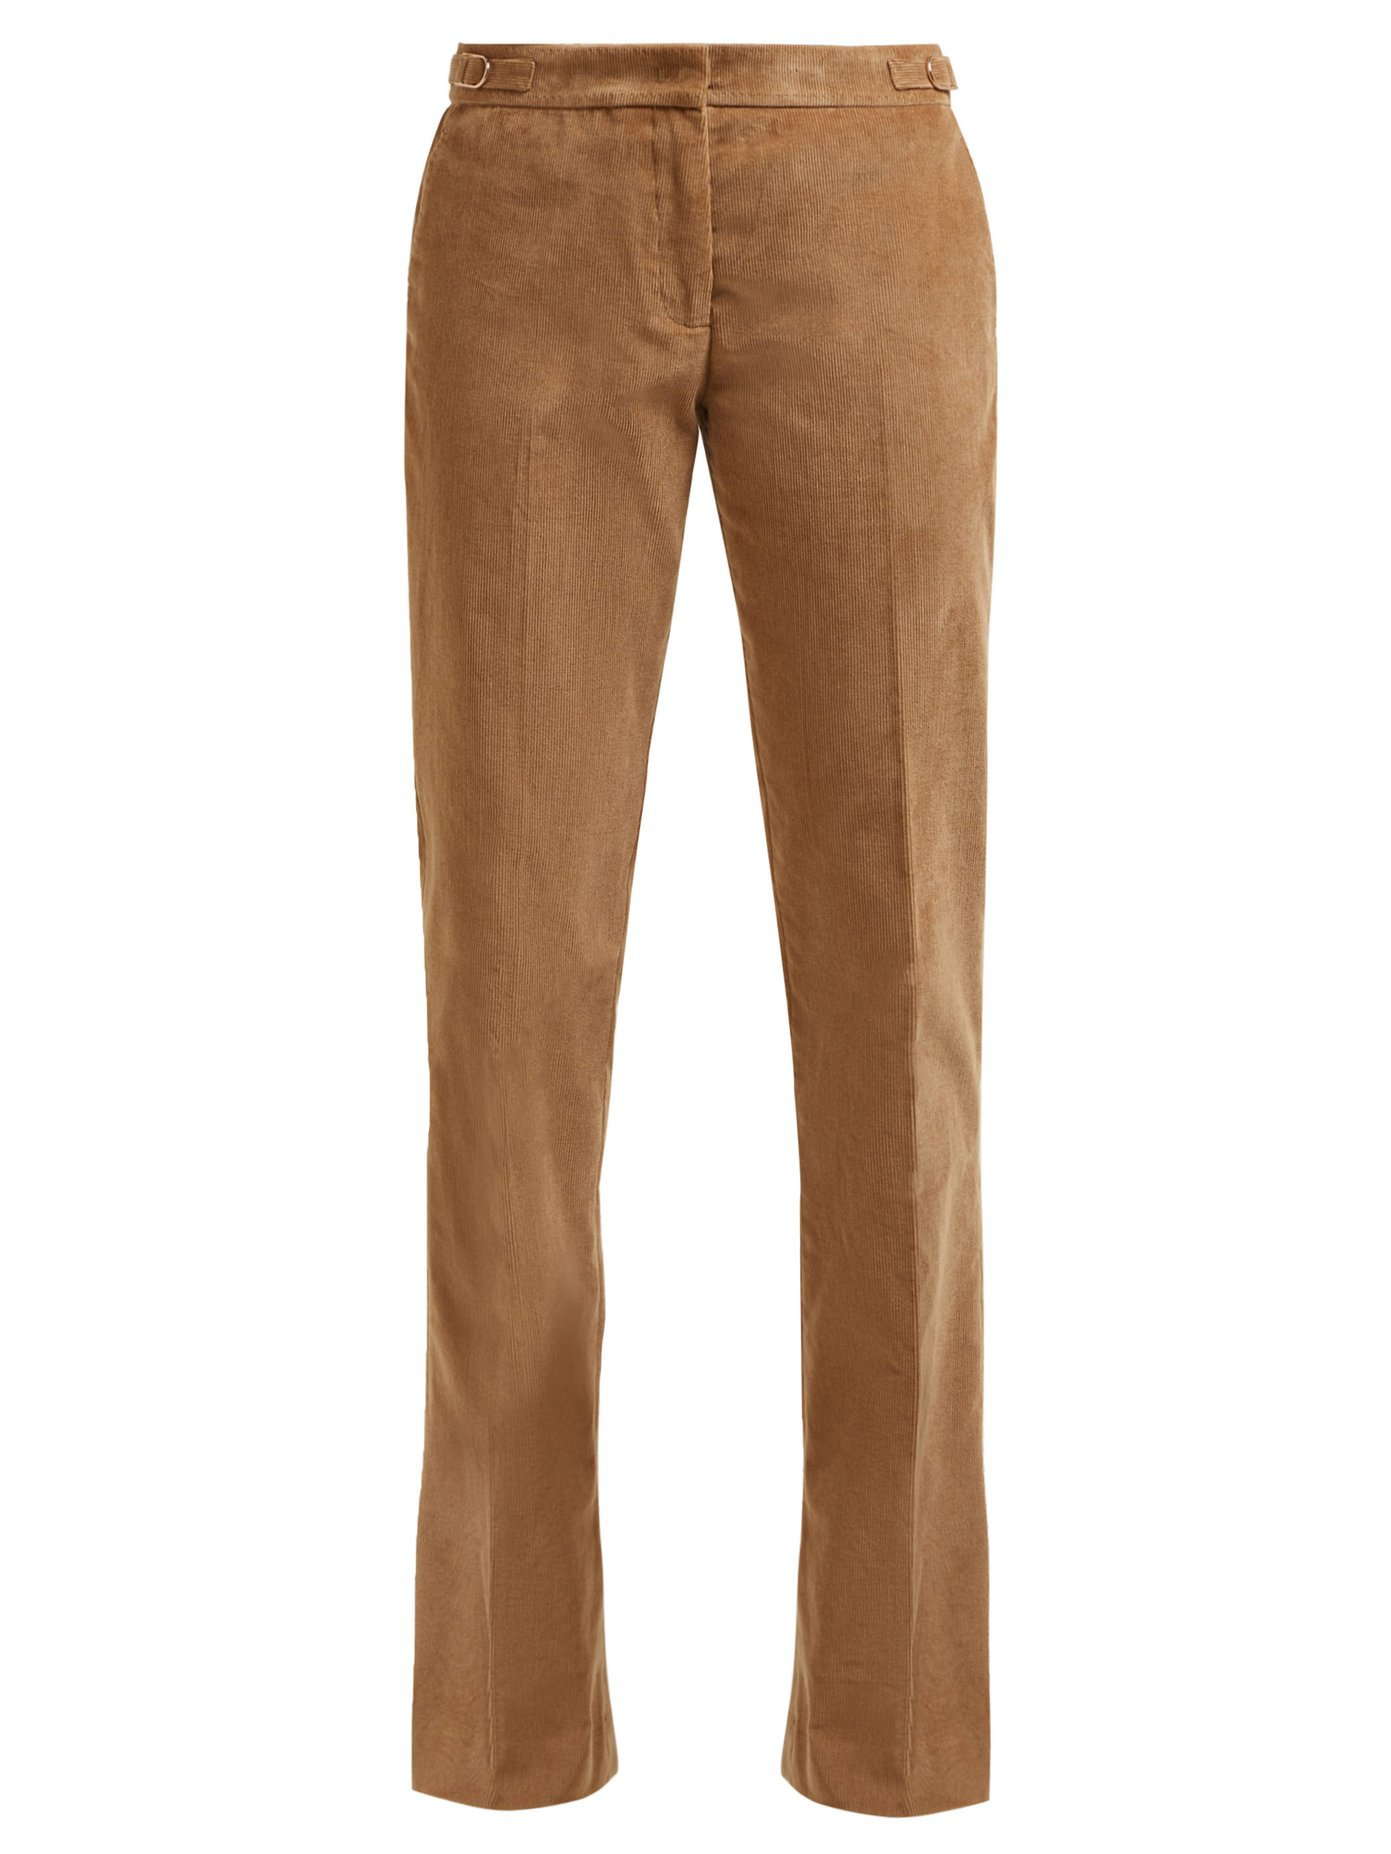 Briggs micro-corduroy wool-blend trousers | Gabriela Hearst | MATCHESFASHION.COM